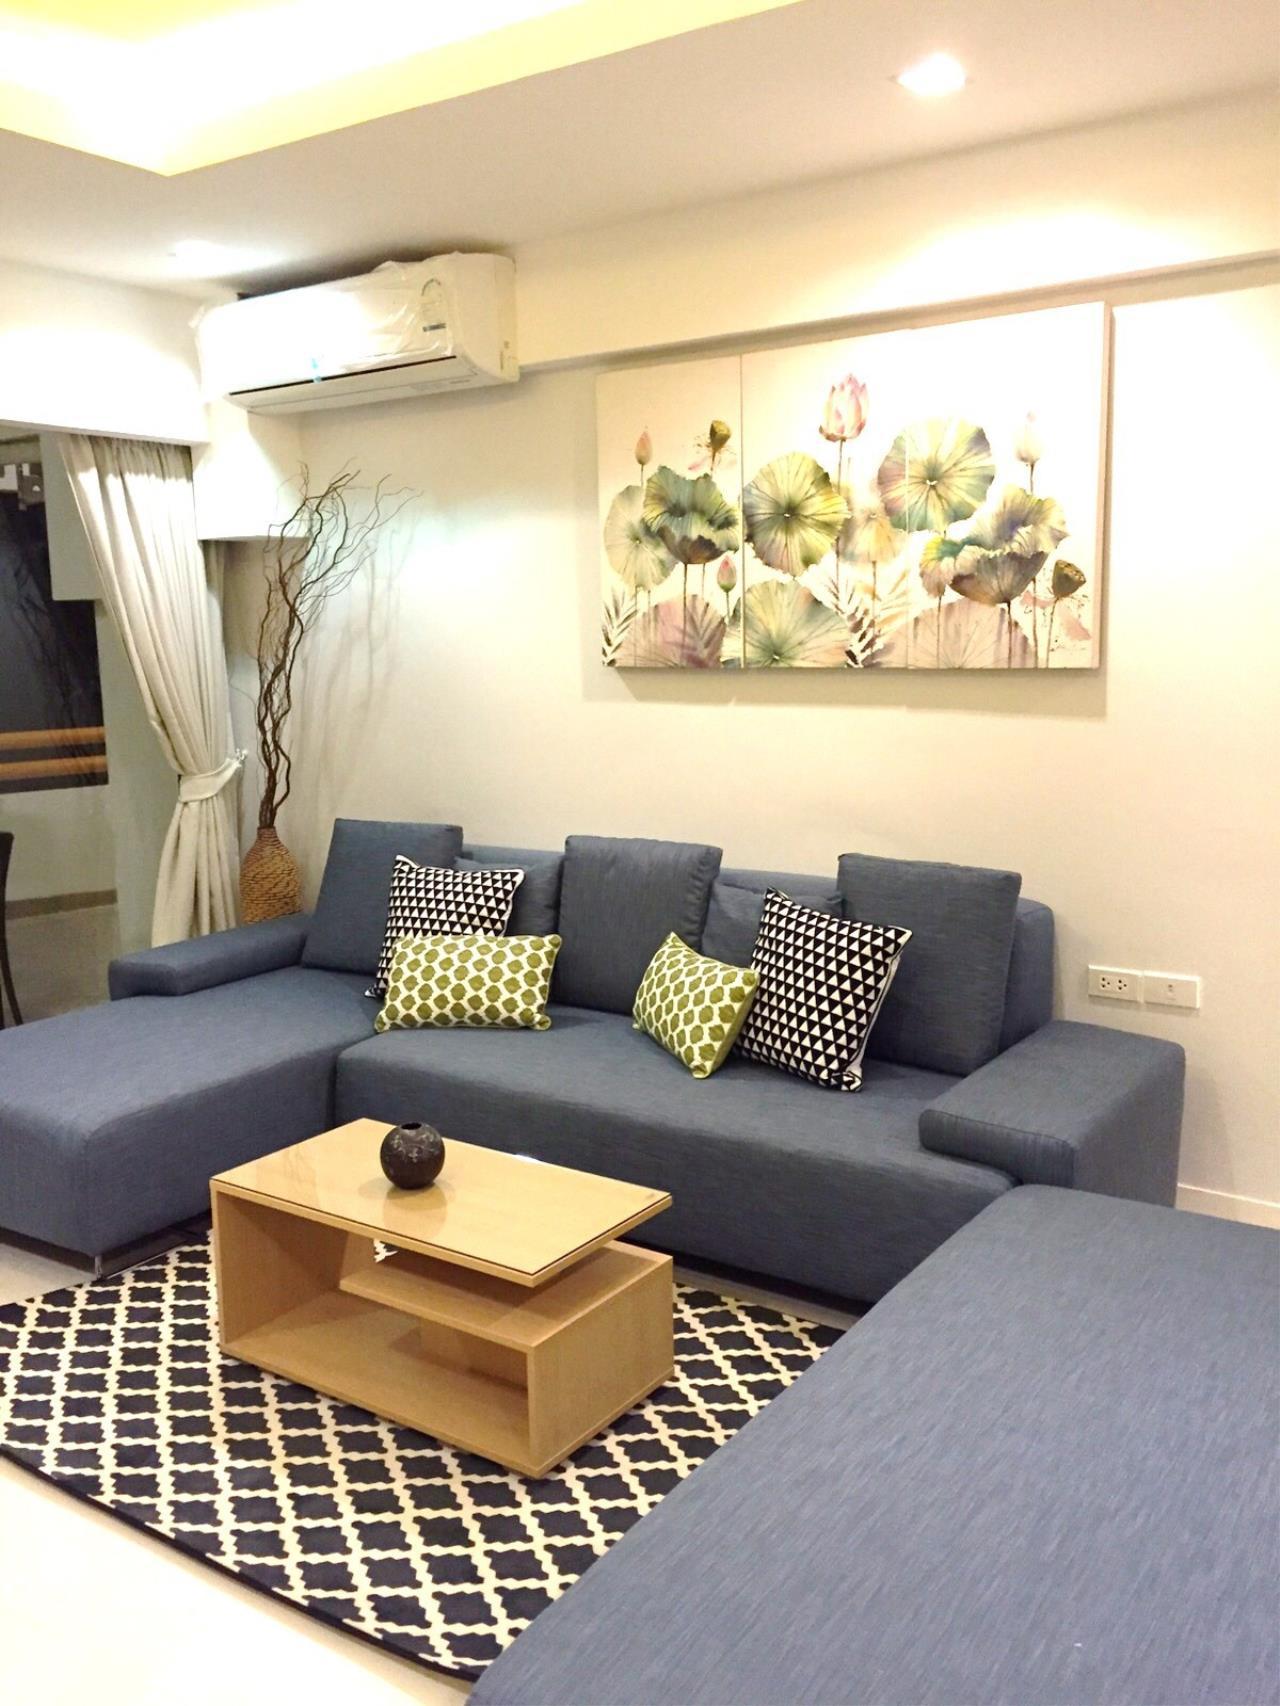 Blueocean property Agency's Condo For Rent – Sunshine Beach Condotel Pattaya 7